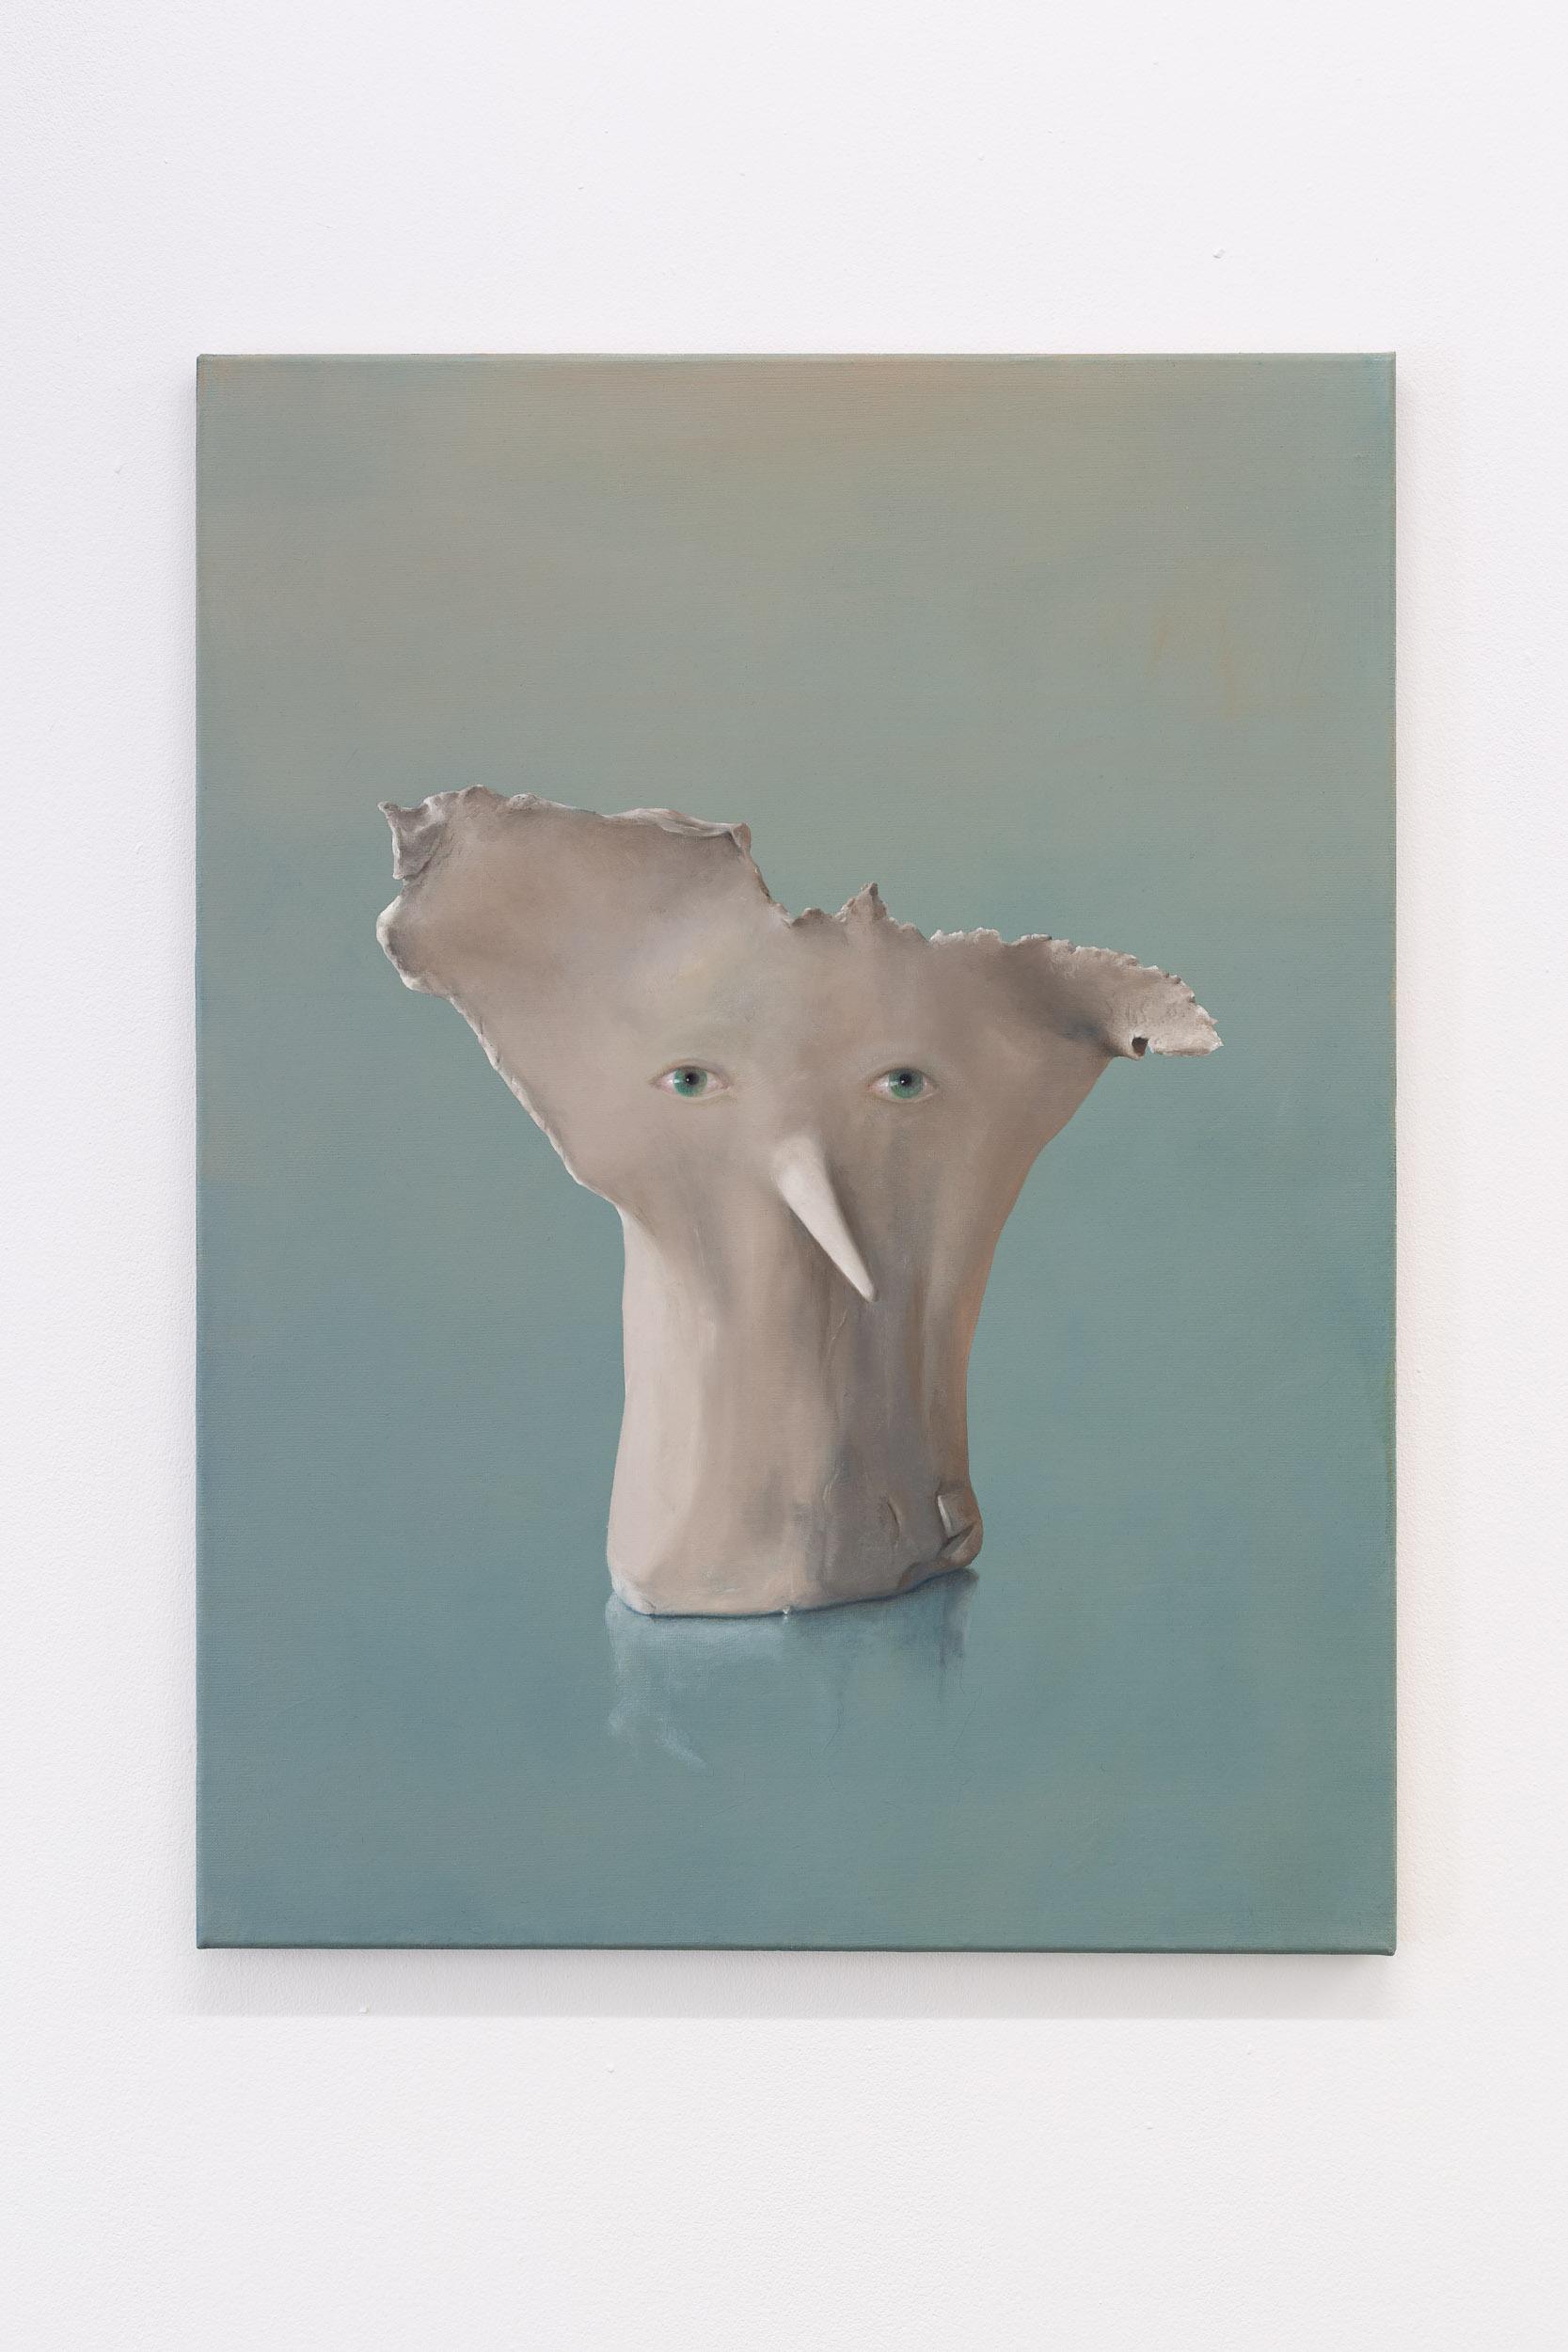 Francisco Sierra,  Untitled (Le Nez) , 2019, oil on wood, 80 x 60 cm  Photo: Kilian Bannwart